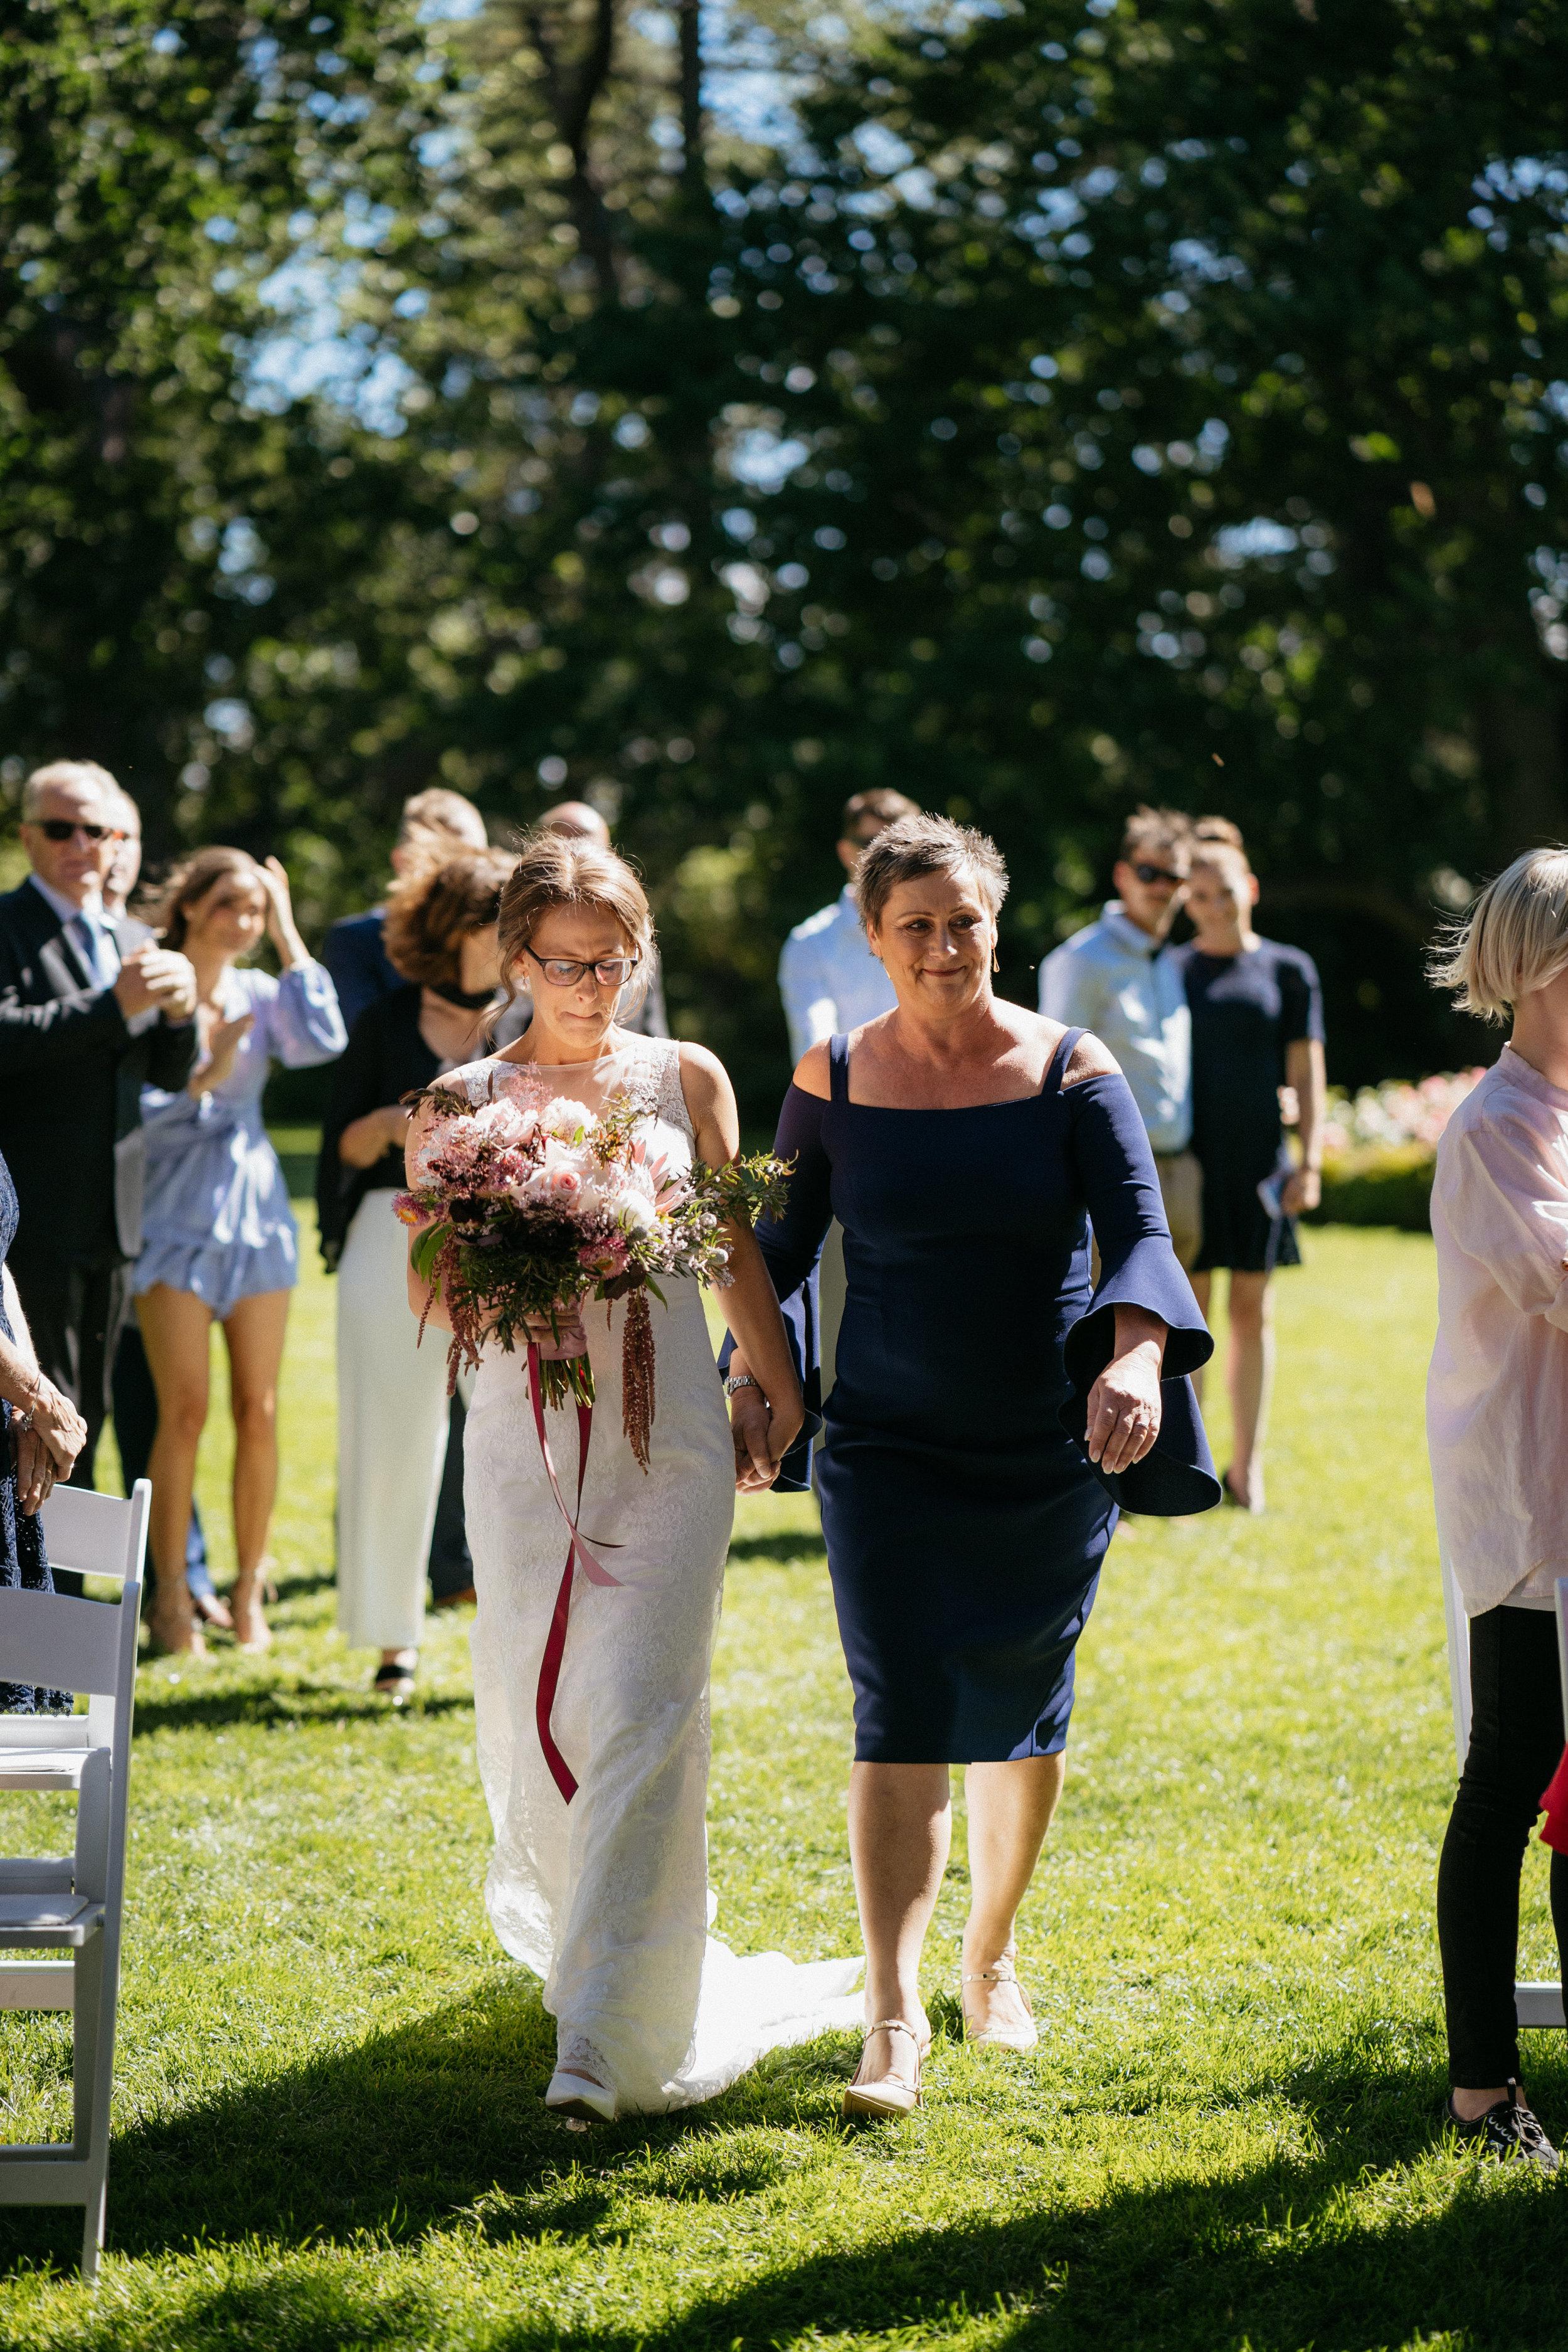 kate-lauren-wedding-154.jpg